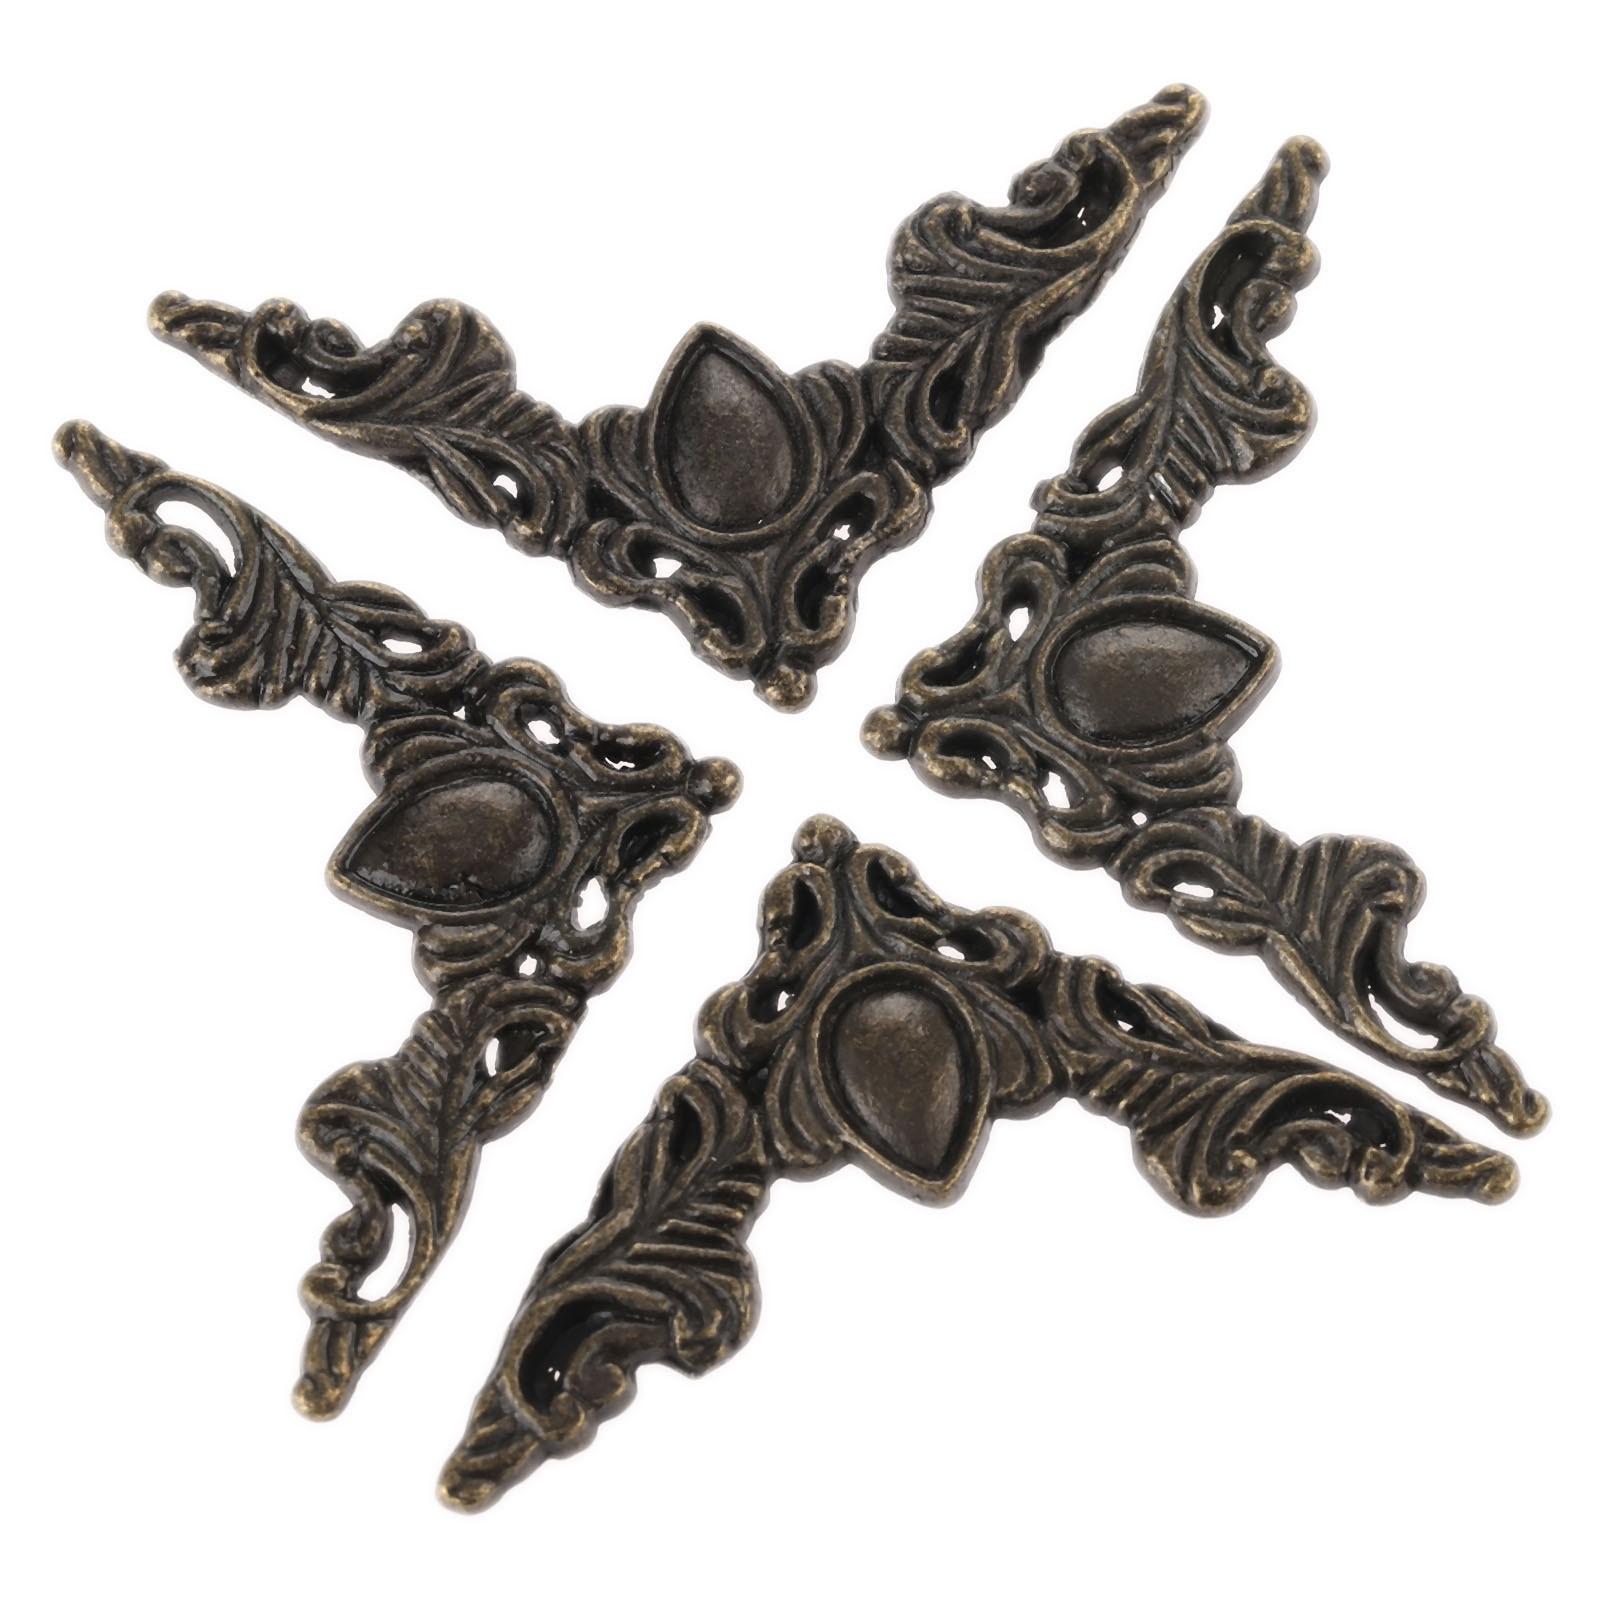 4Pcs Antique Bronze Jewelry Box Book Corner Bracket Antique Frame Accessories Notebook Menus Decorative Protector 40*40*55*1mm